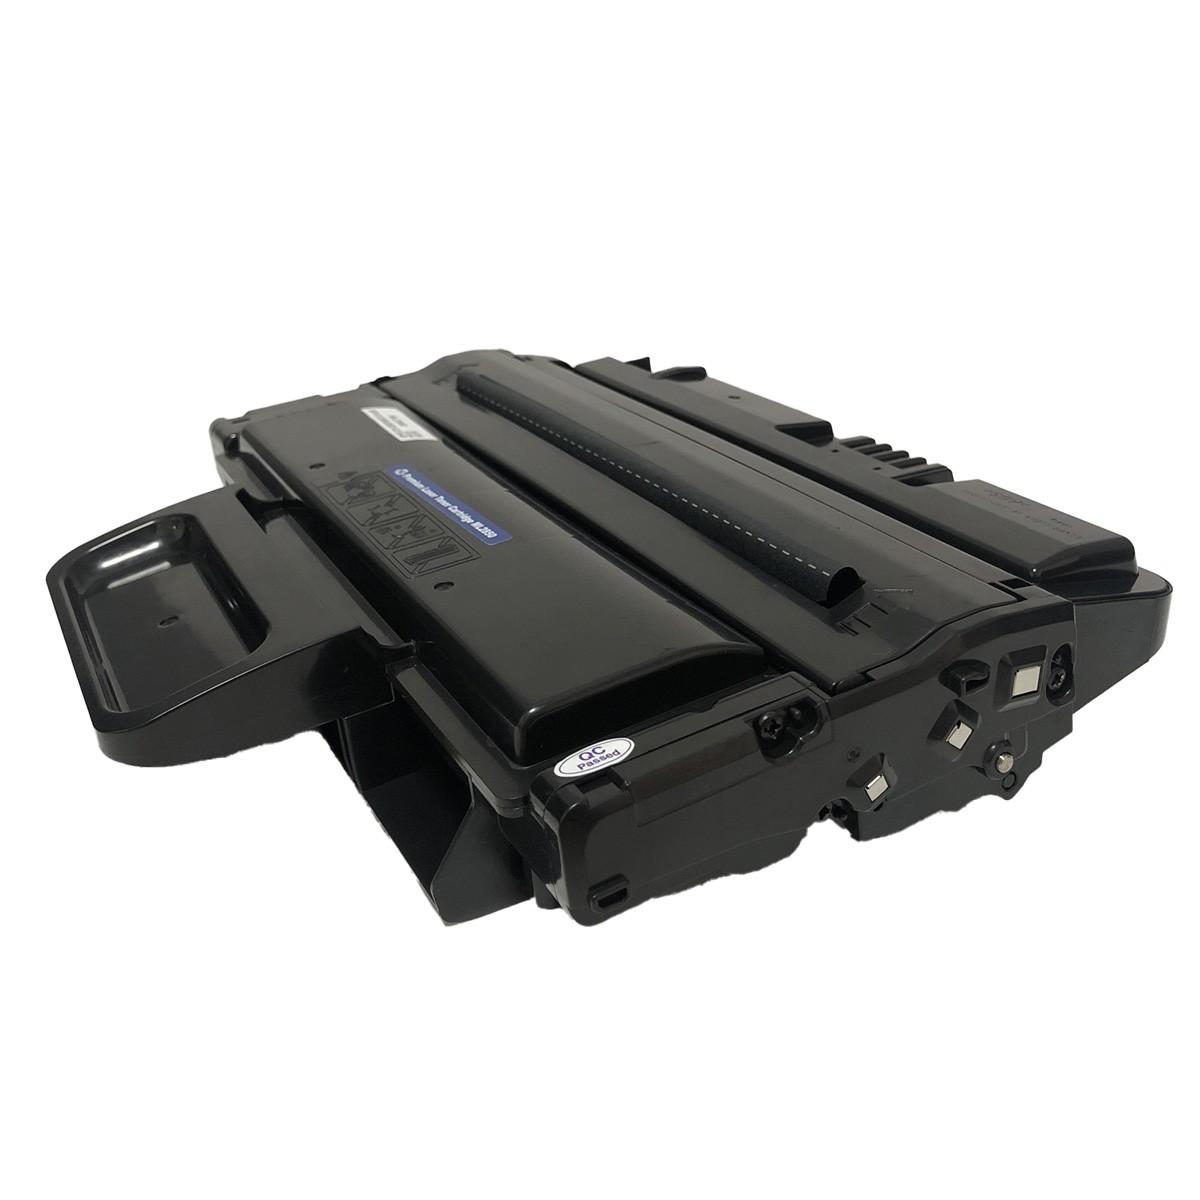 Toner Premium ML2850B Compatível com ML2851ND ML2851NDL da Samsung